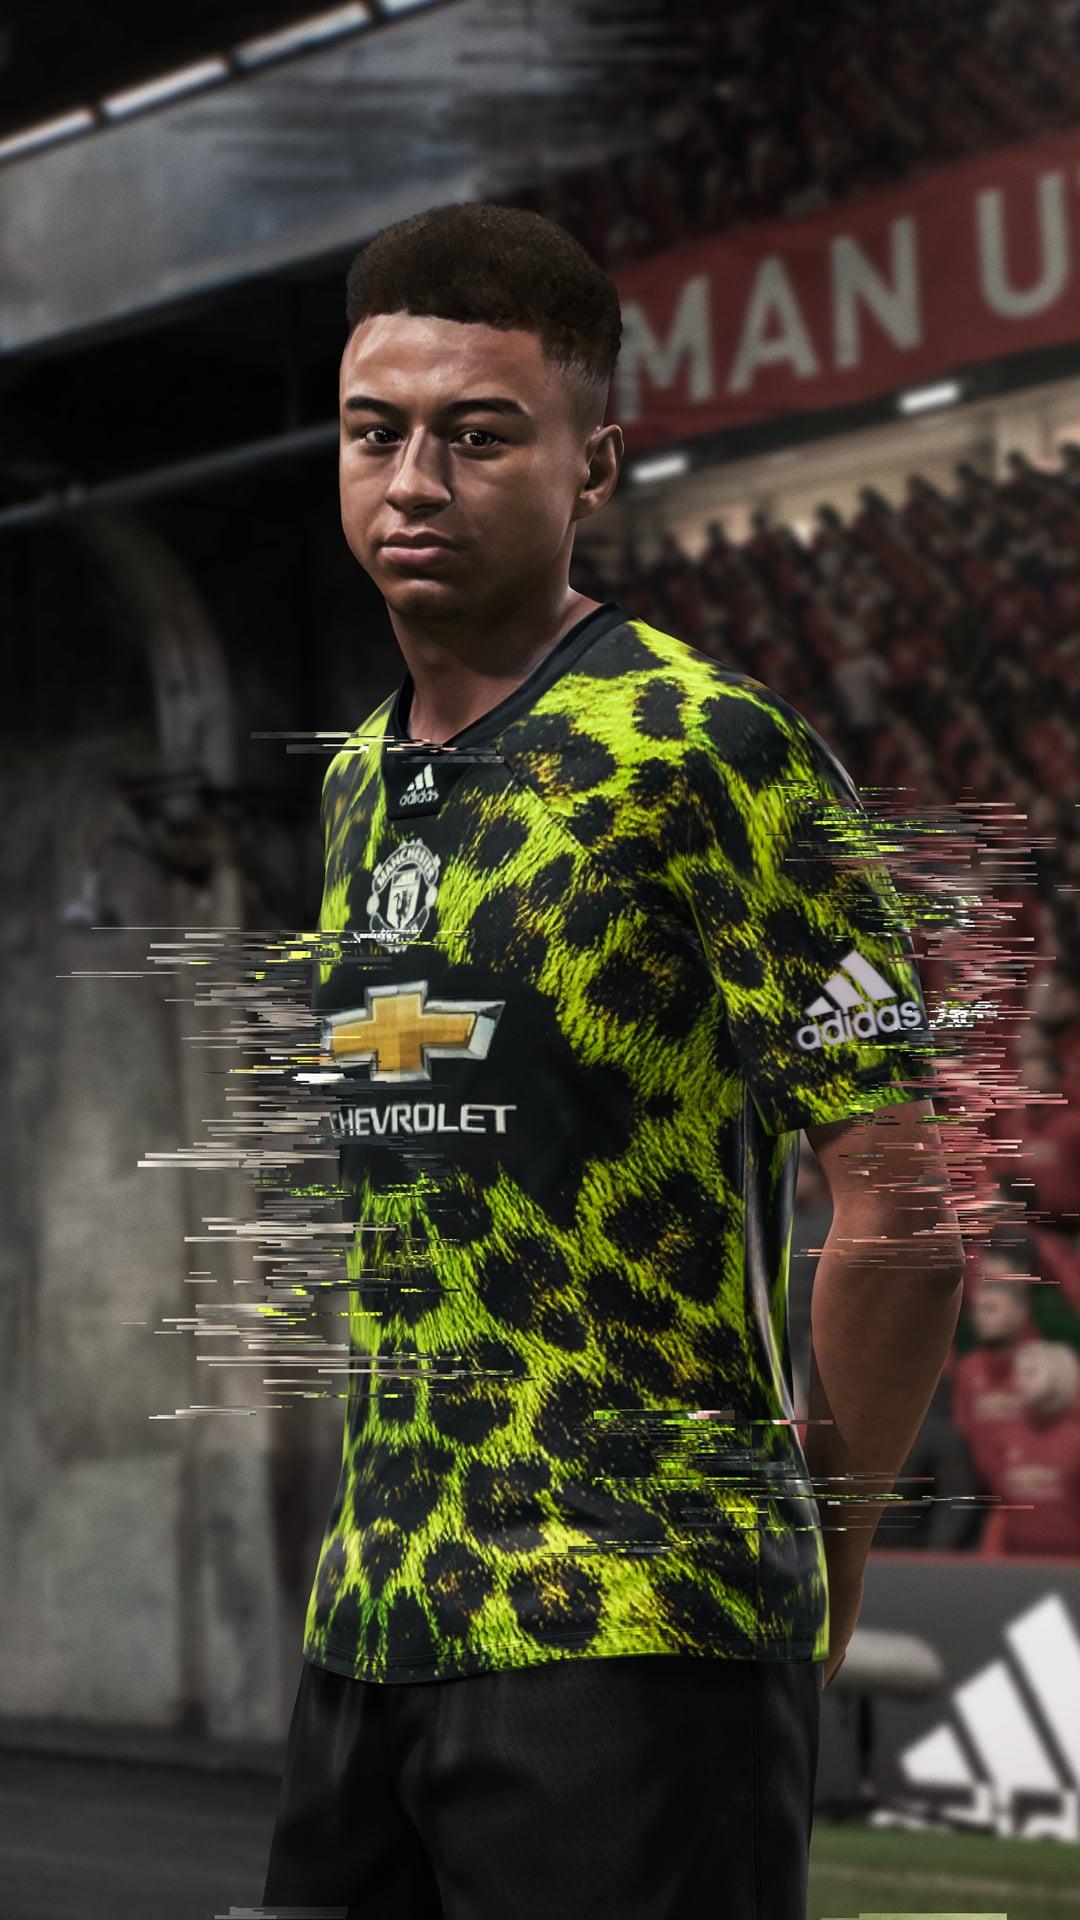 maillot-manchester-united-ea-sport-2018-fifa19